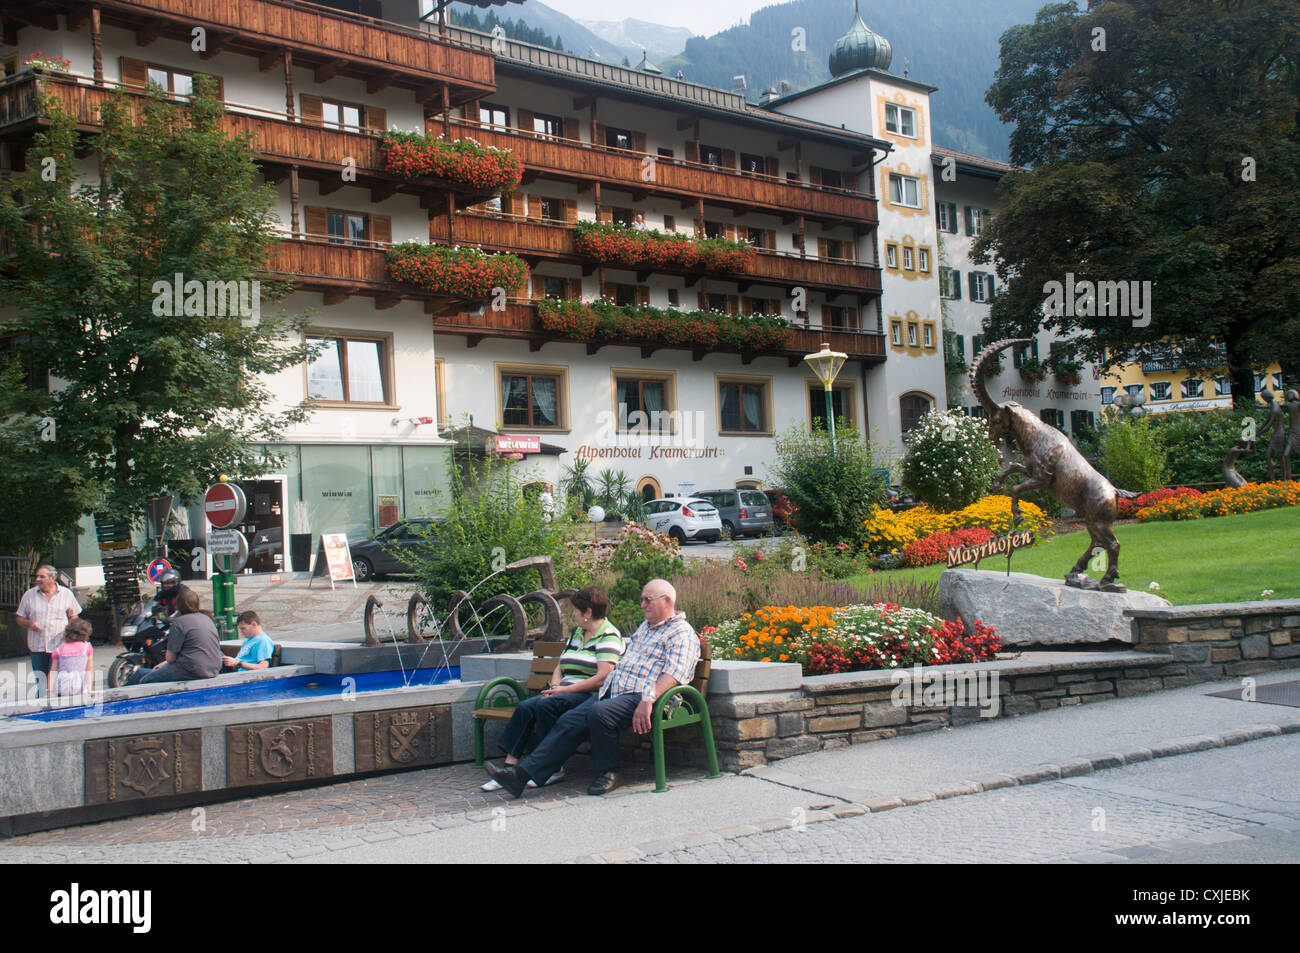 Mayrhofen, Zillertal, Tyrol, Austria Stock Photo